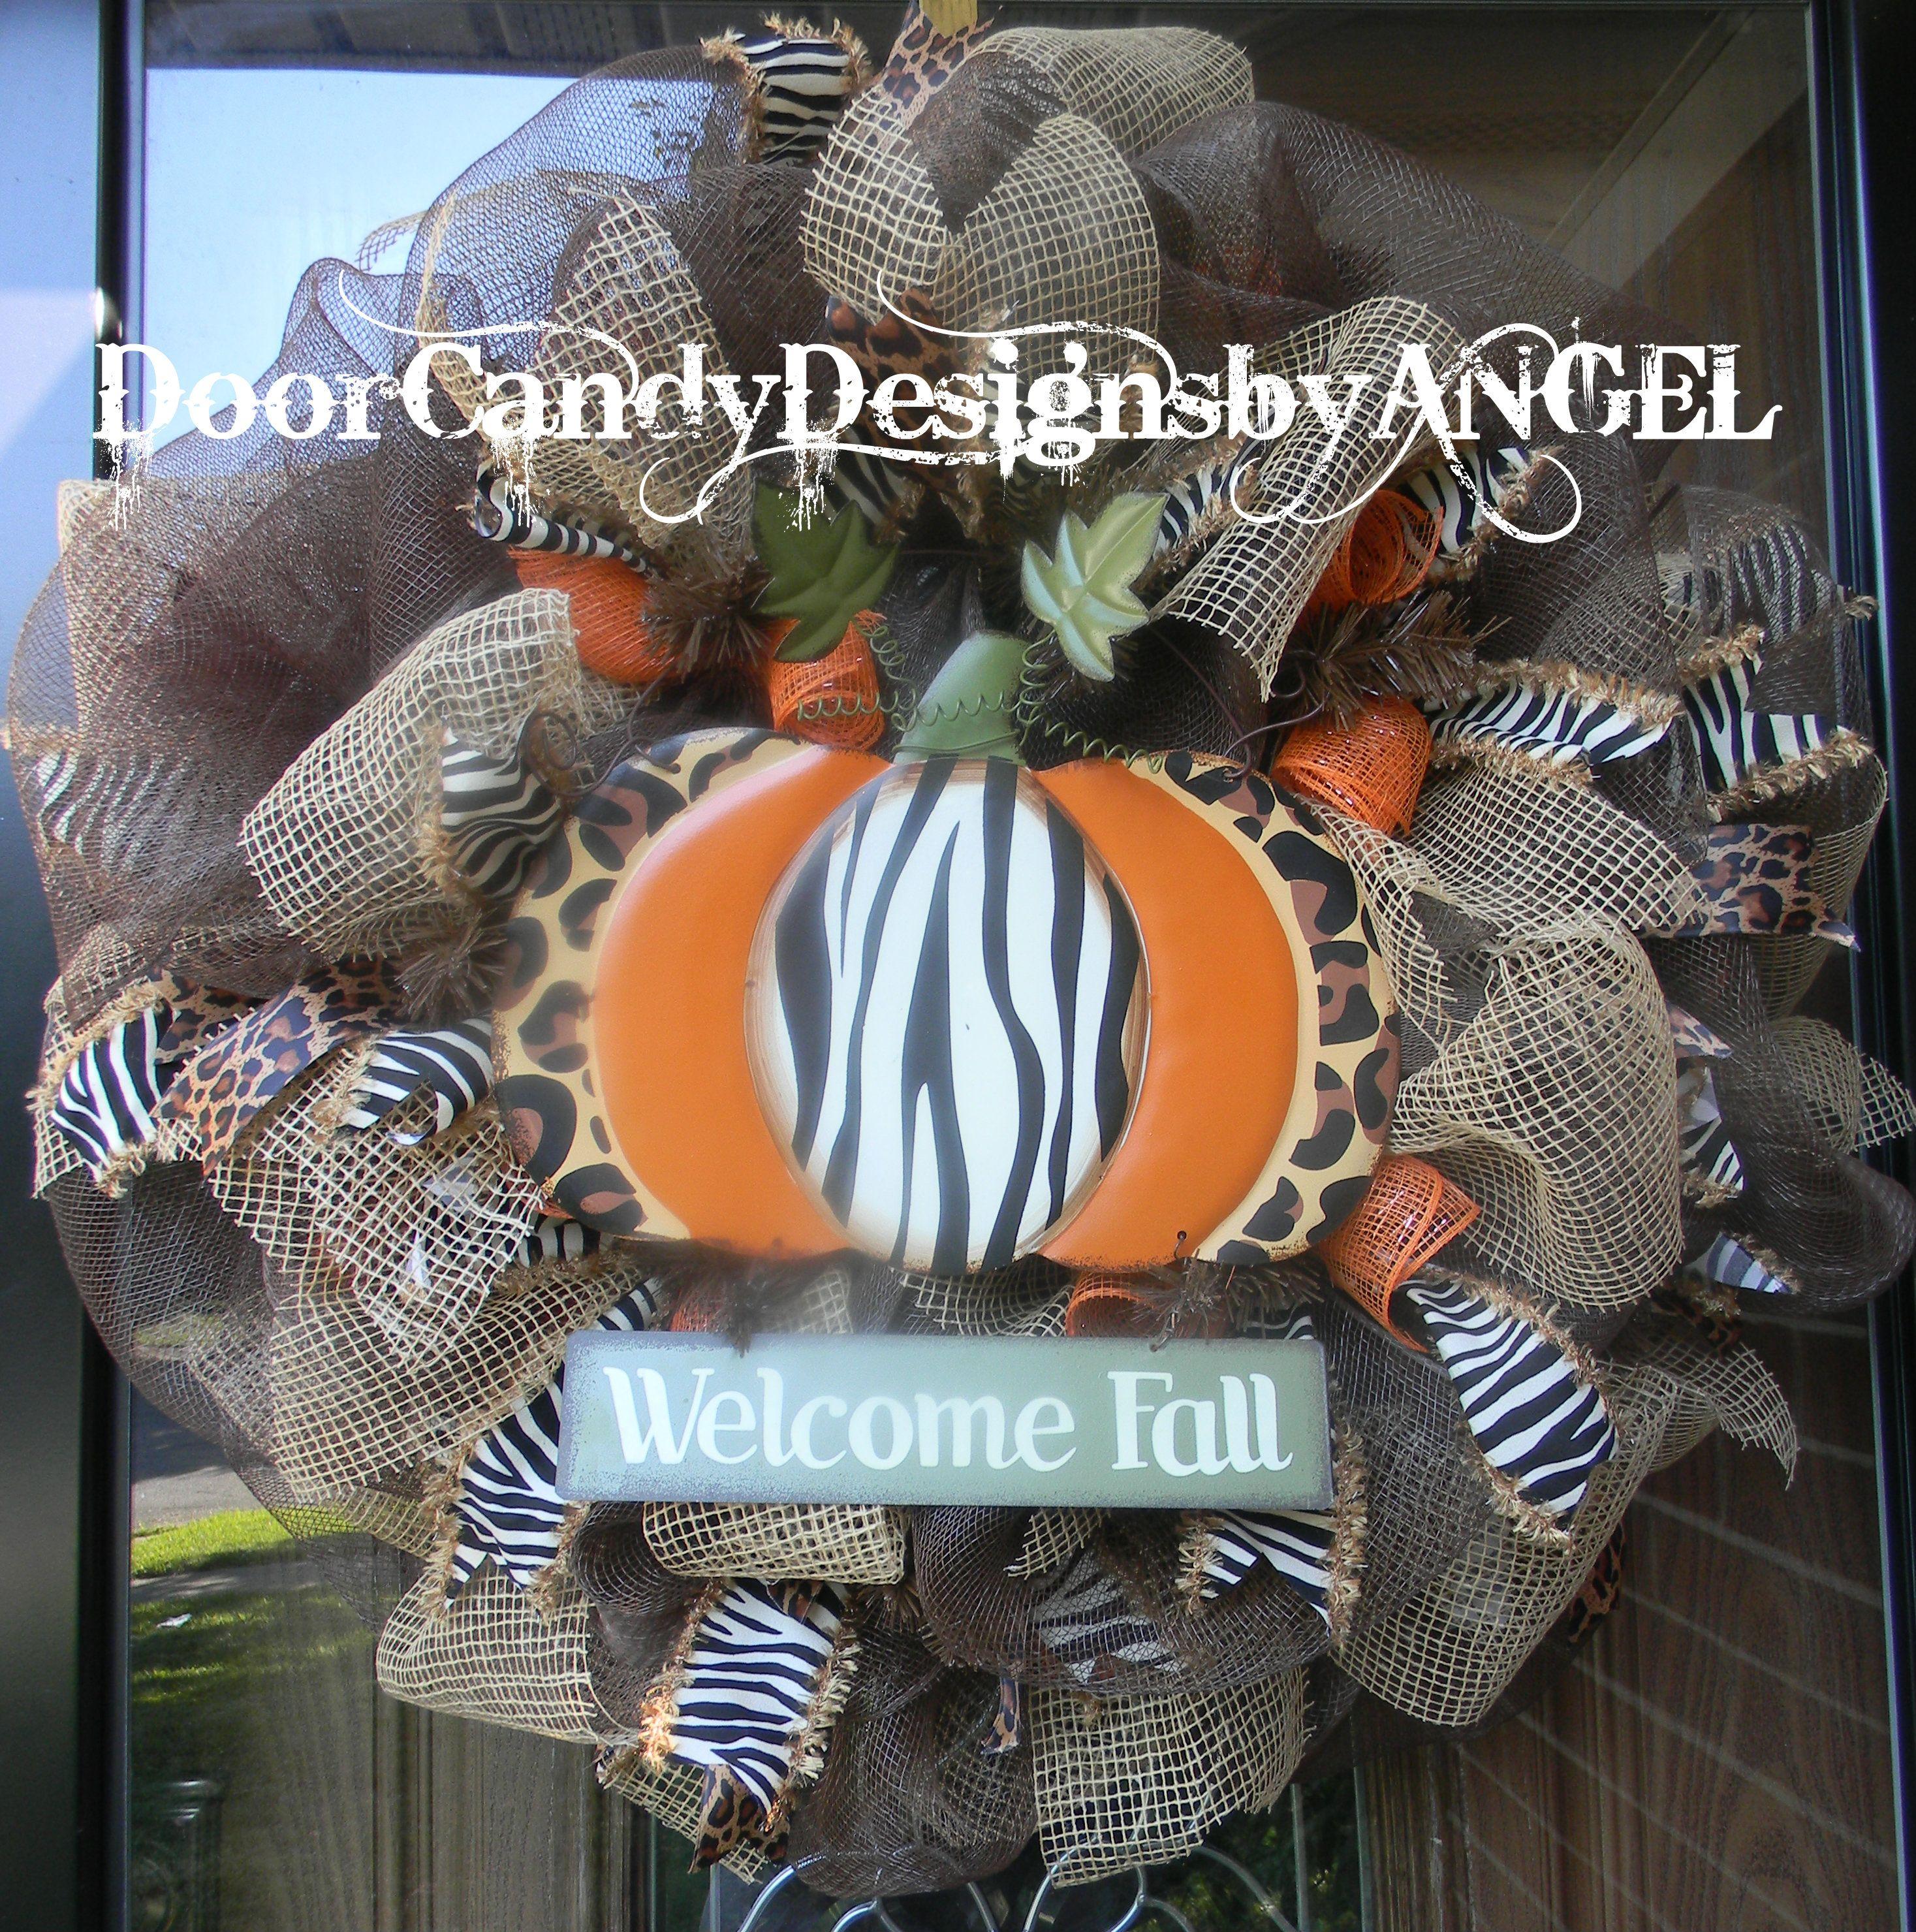 Fall Burlap Design Door candy, fall